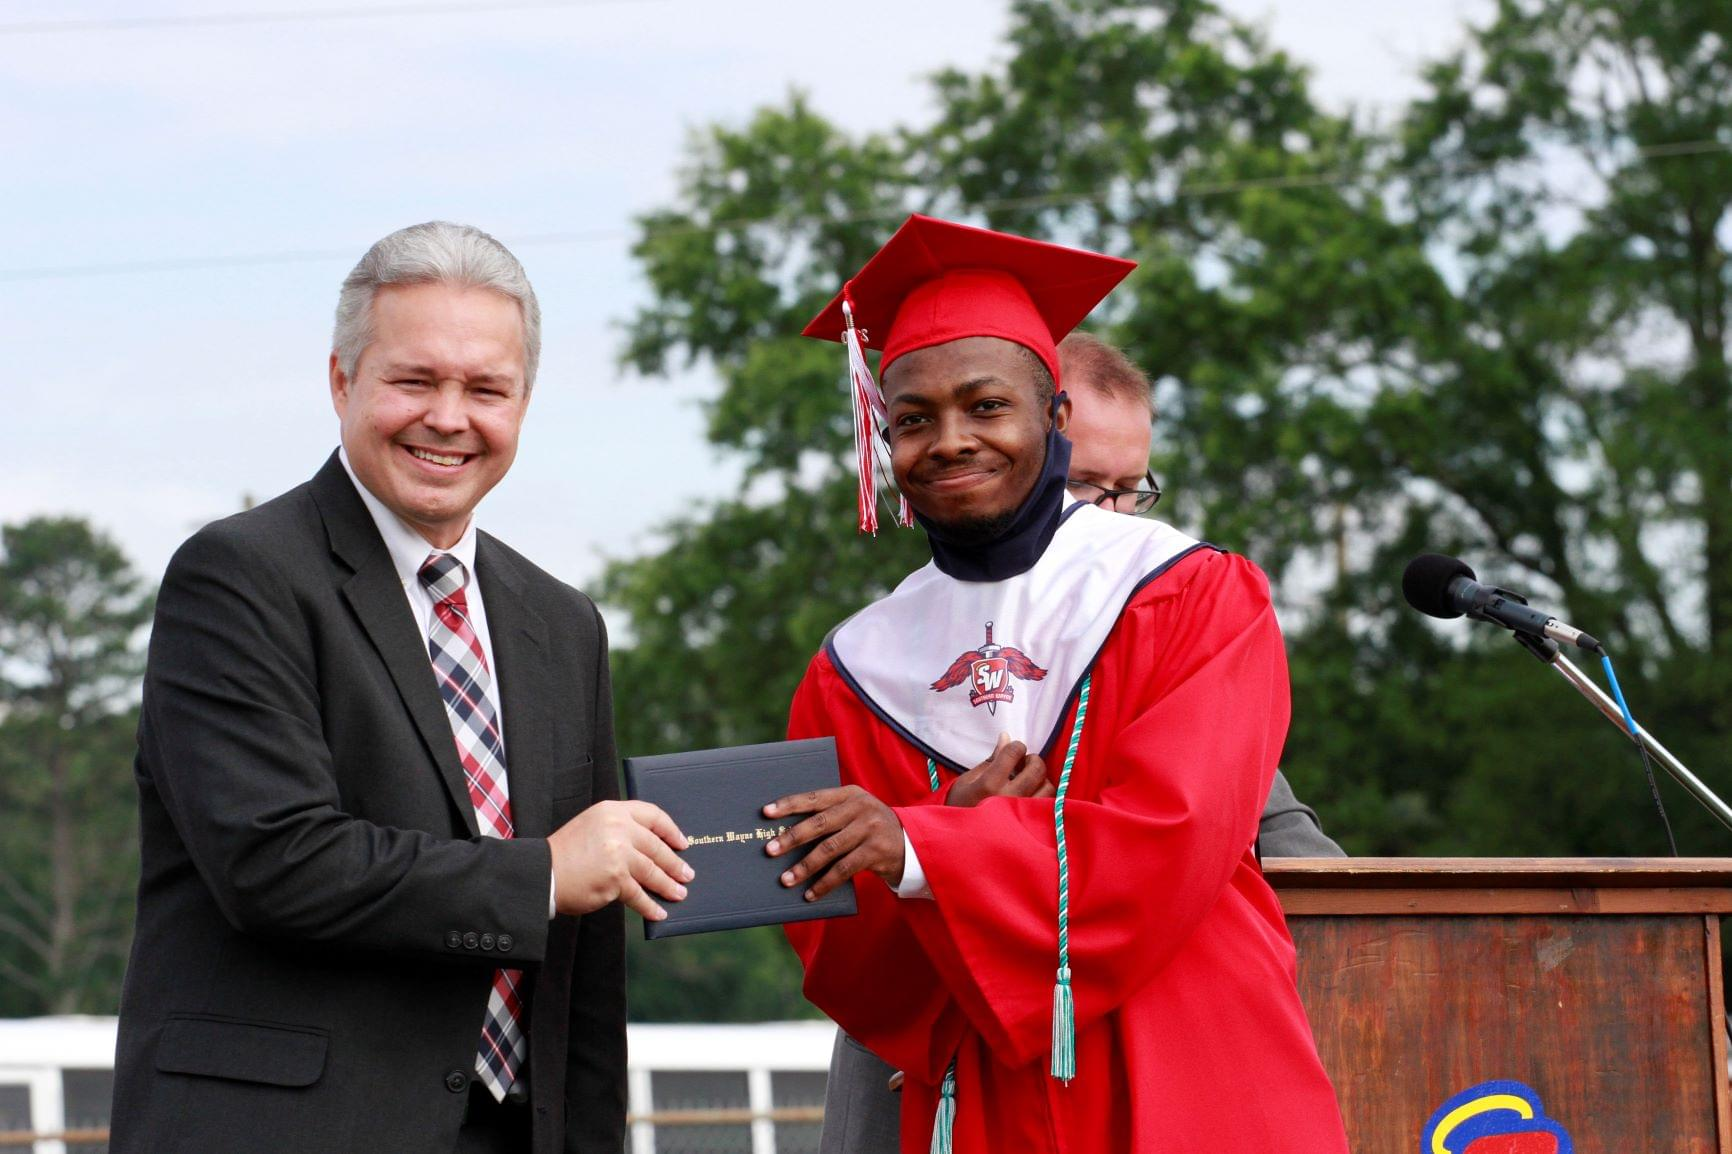 Southern Wayne High School Graduation (PHOTO GALLERY)